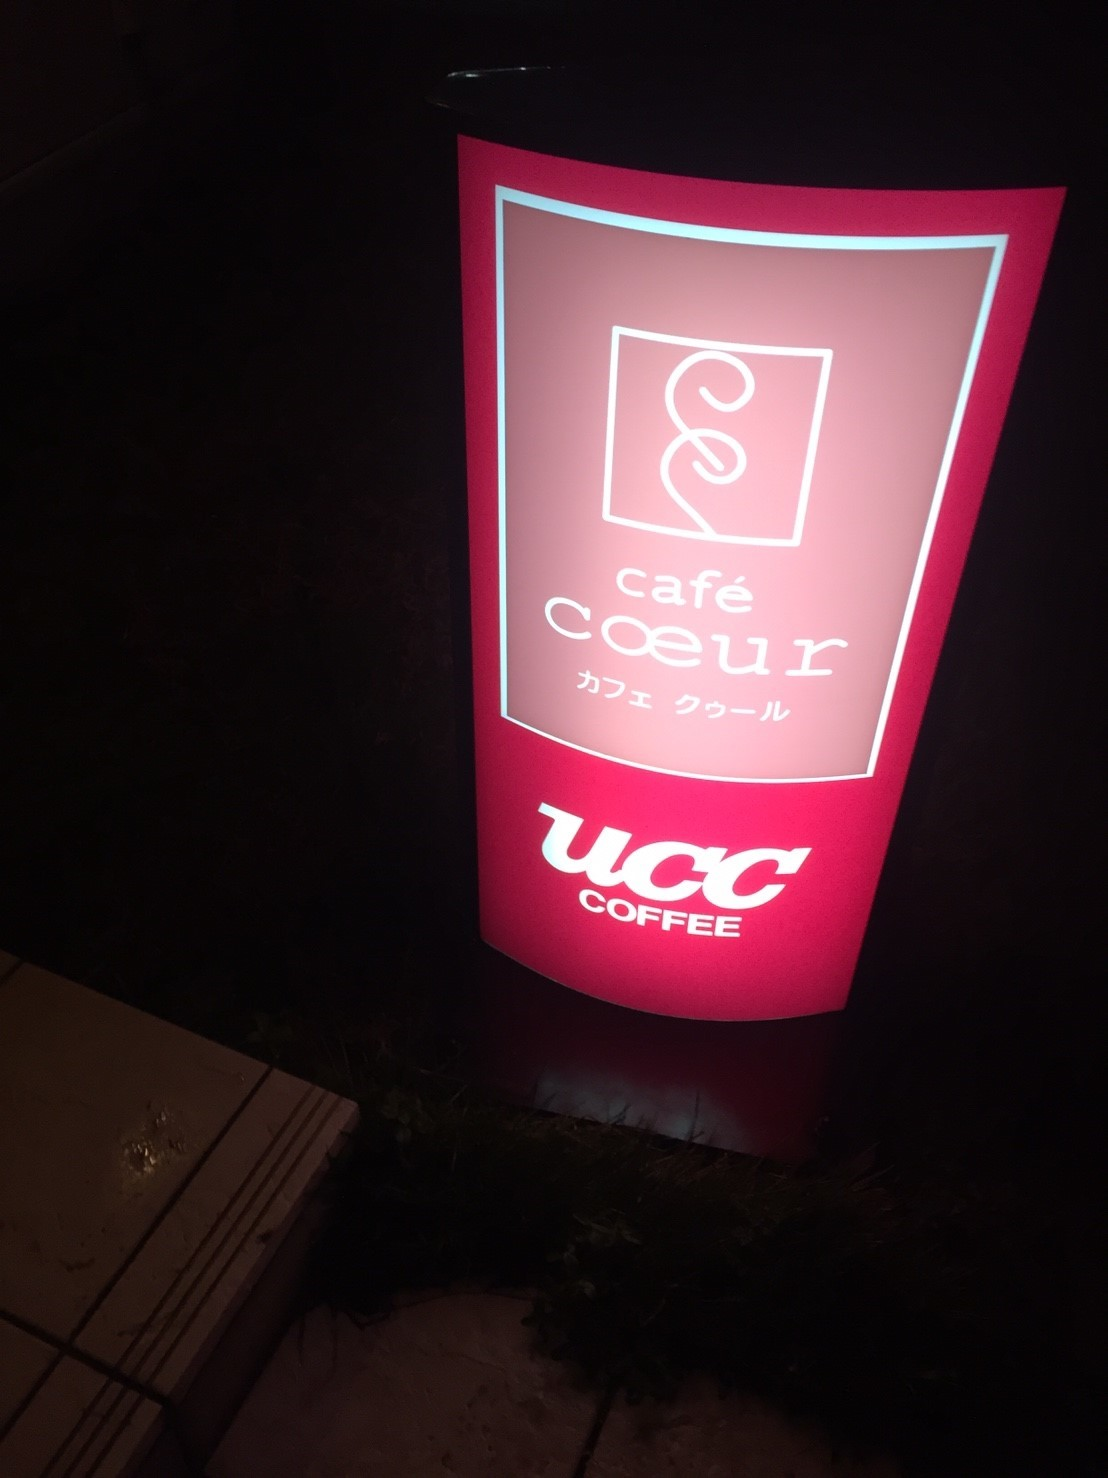 cafe coeur ディナービュッフェ_e0115904_02285360.jpg